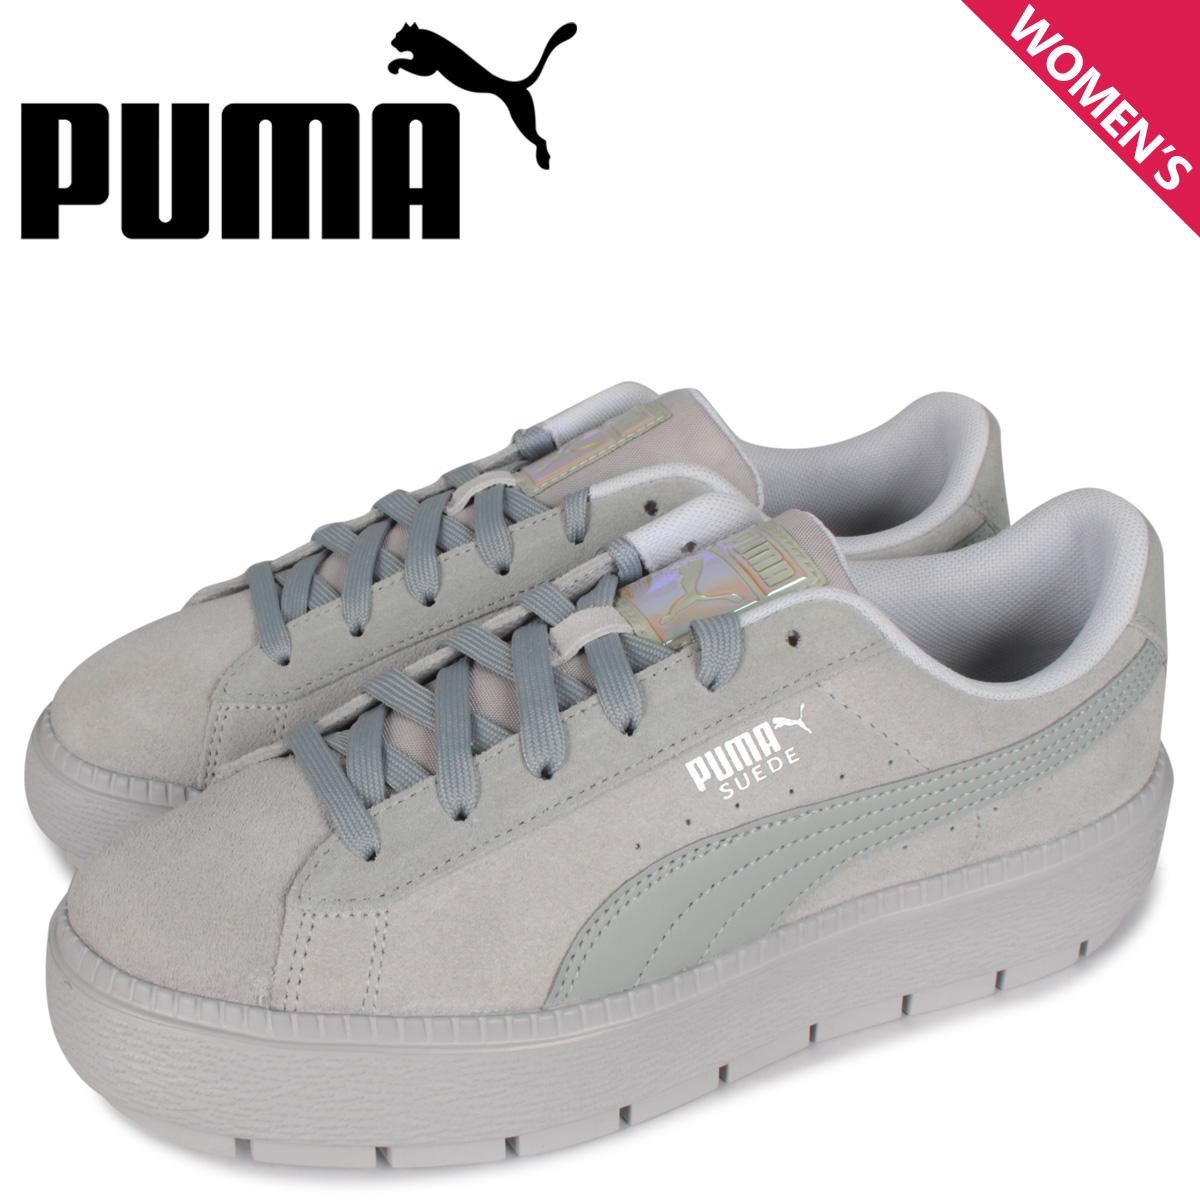 PUMA プーマ スエード プラットフォーム スニーカー レディース 厚底 SUEDE PLATFORM TRACE LITE WNS グレー 37369502